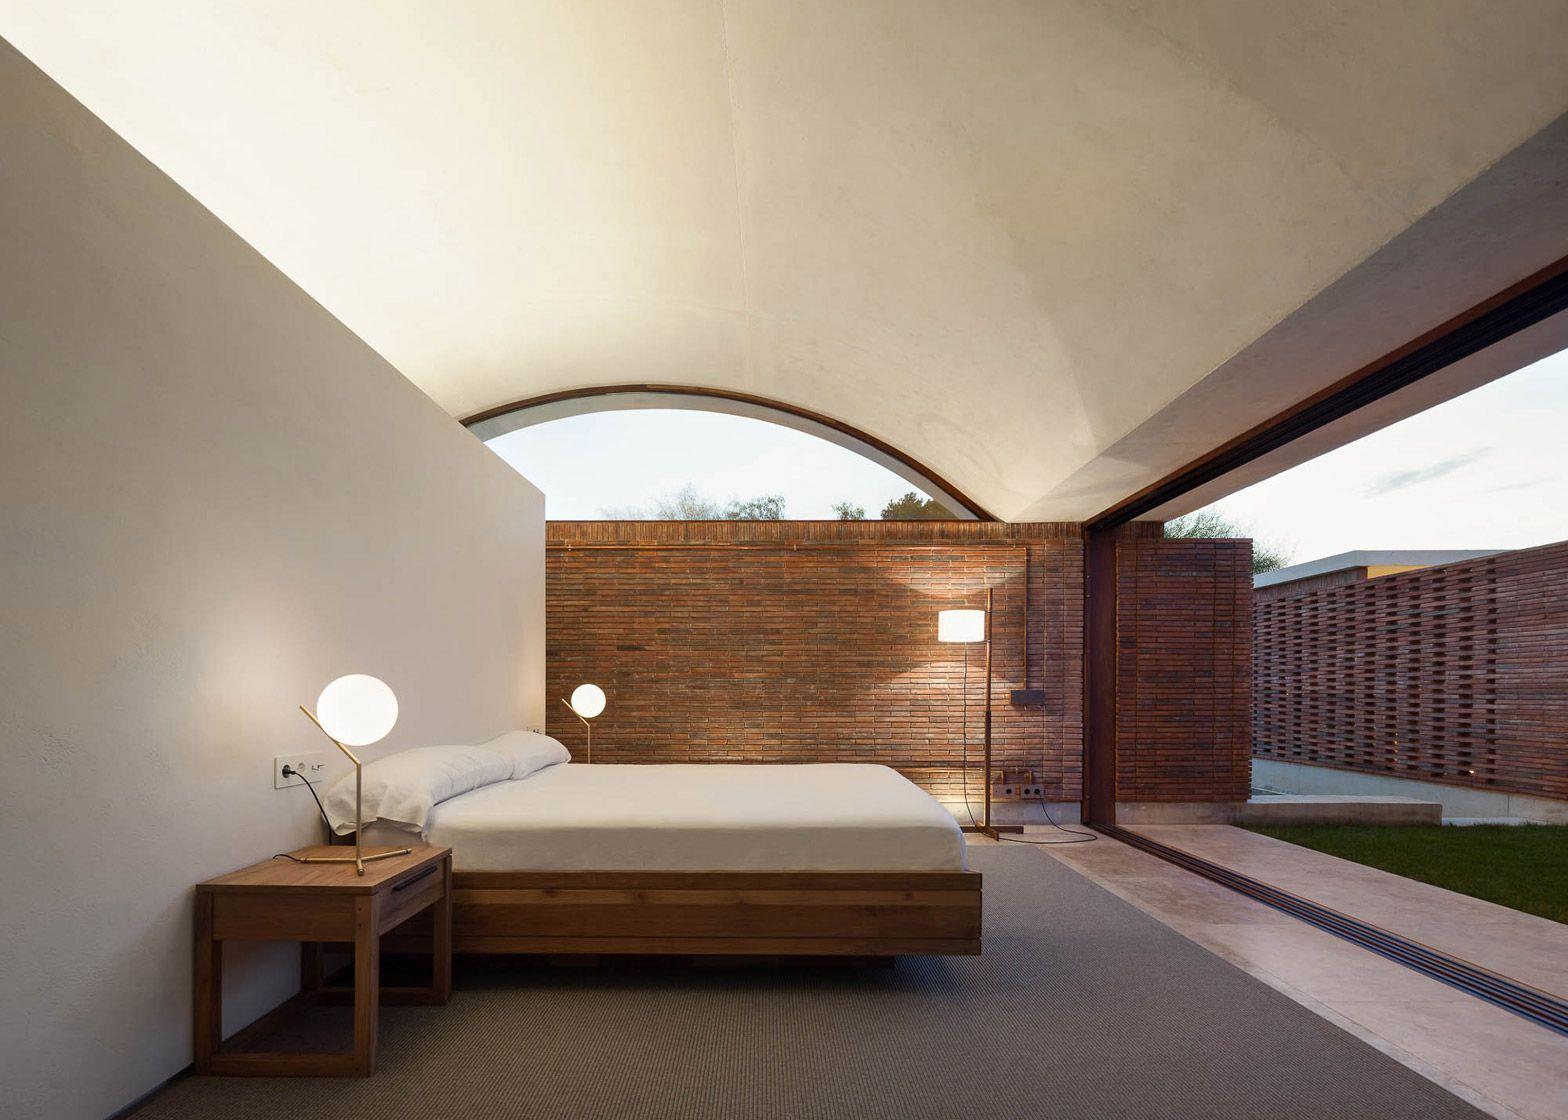 mesura-iv-house-casa-elche-architecture-arquitectura-elche-alicante-spain_dezeen_1568_2.jpg (1568×1120)